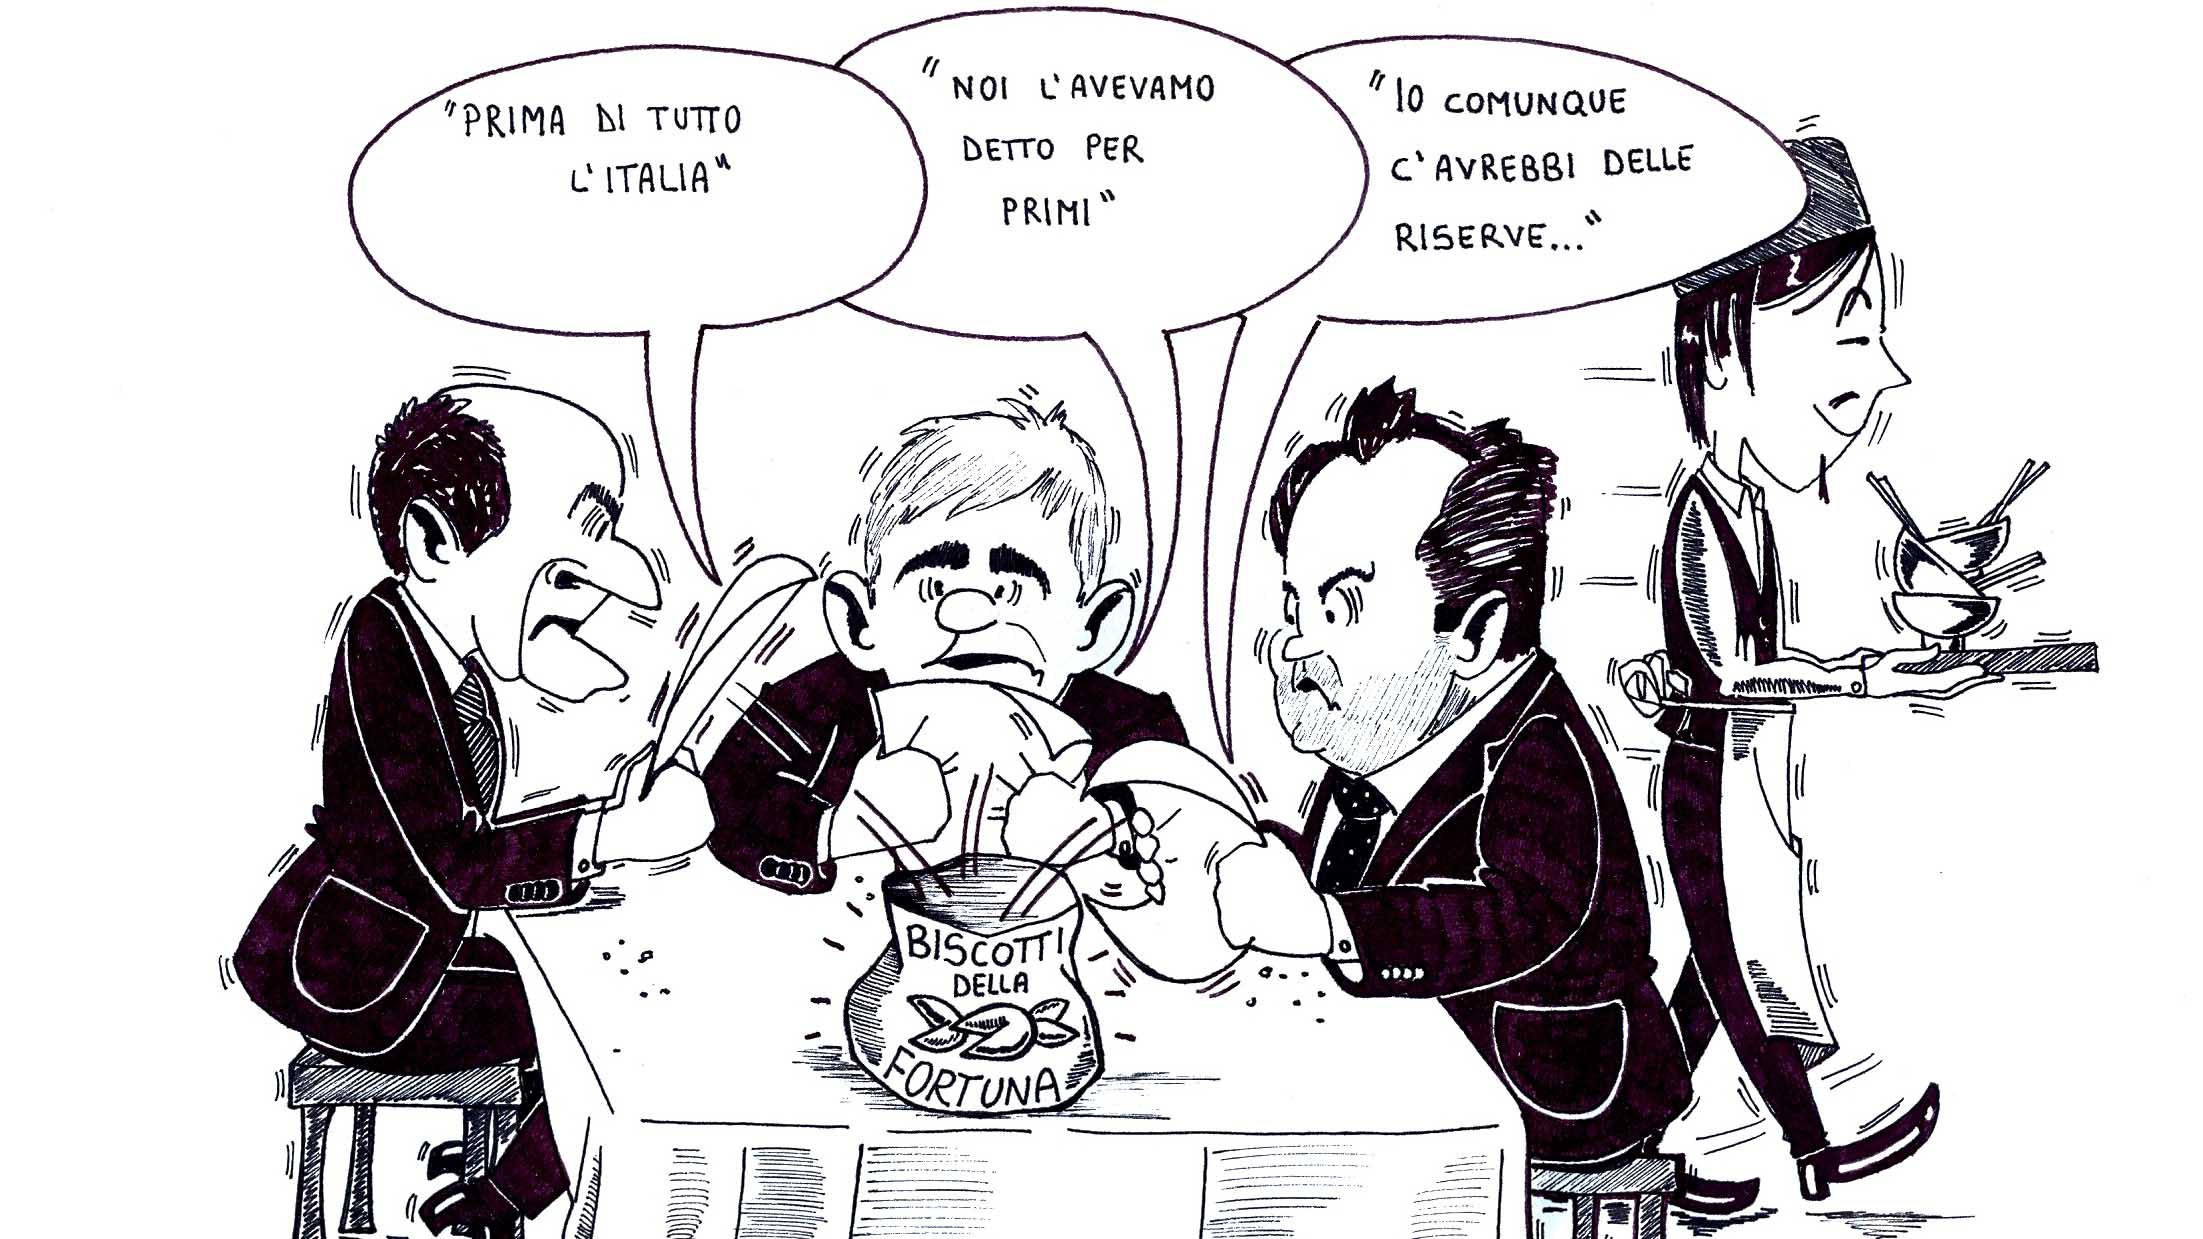 vignettapostmonti